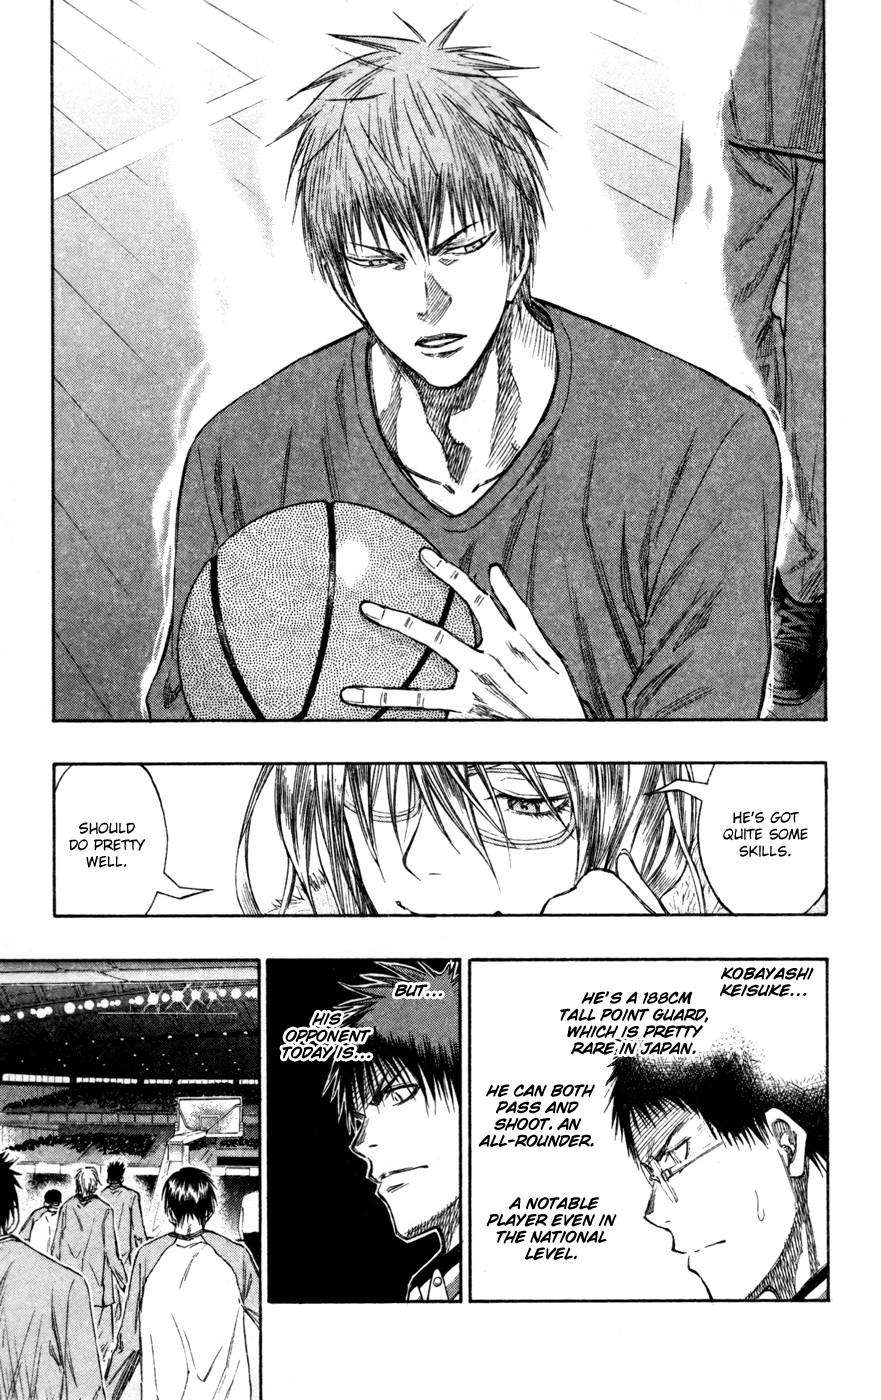 Kuroko no Basket Manga Chapter 141 - Image 13